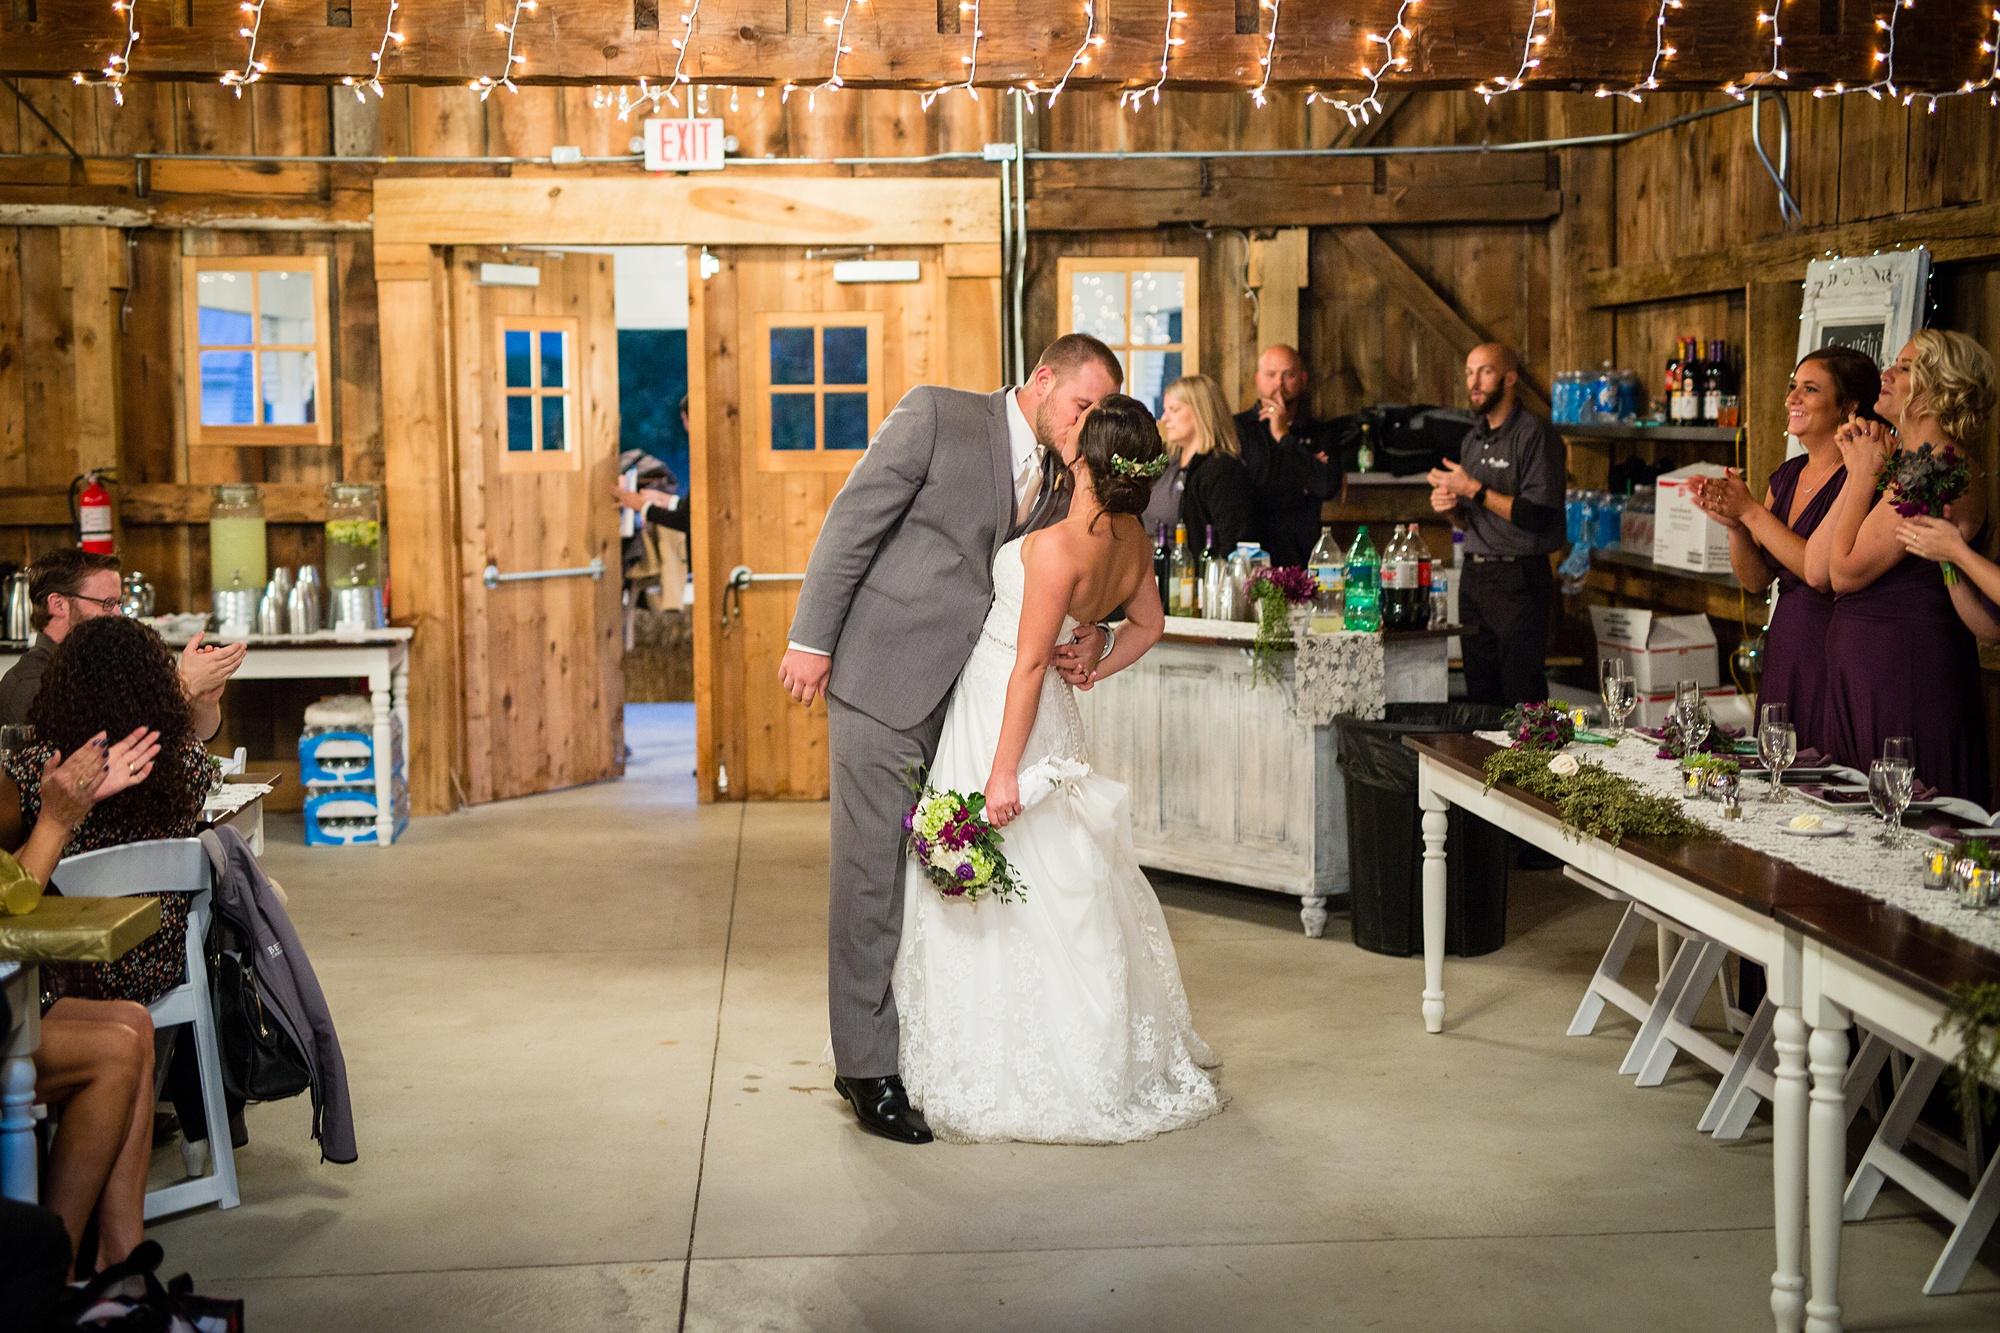 Brandon_Shafer_Photography_Emily_Travis_Kalamazoo_Wedding_Photography_0049.jpg